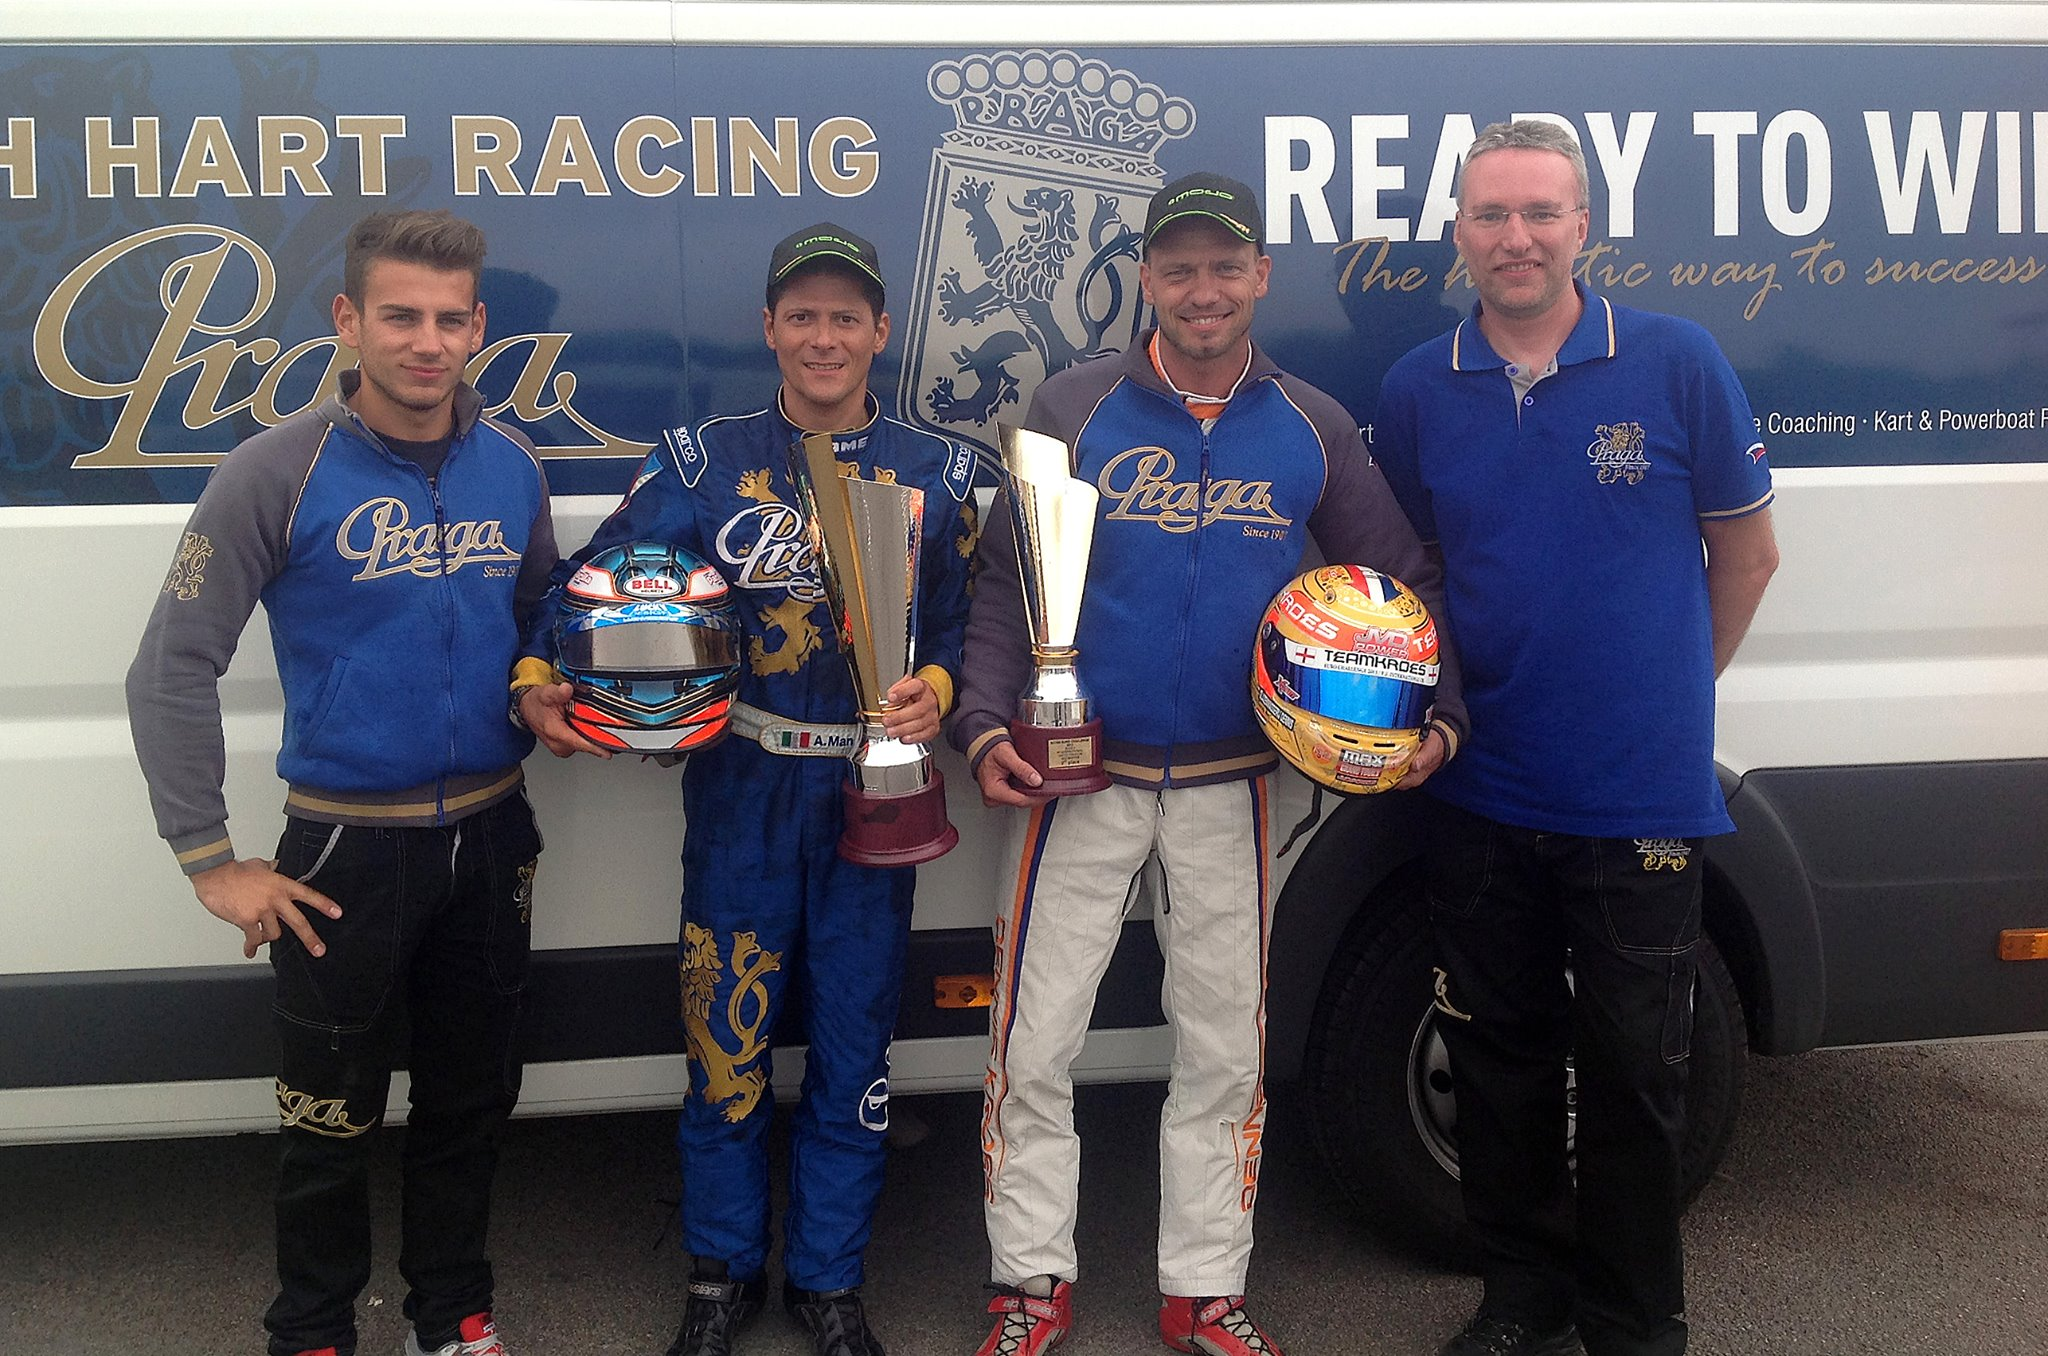 Alessandro Manetti wins again on Praga at Rotax Max Euro Challenge